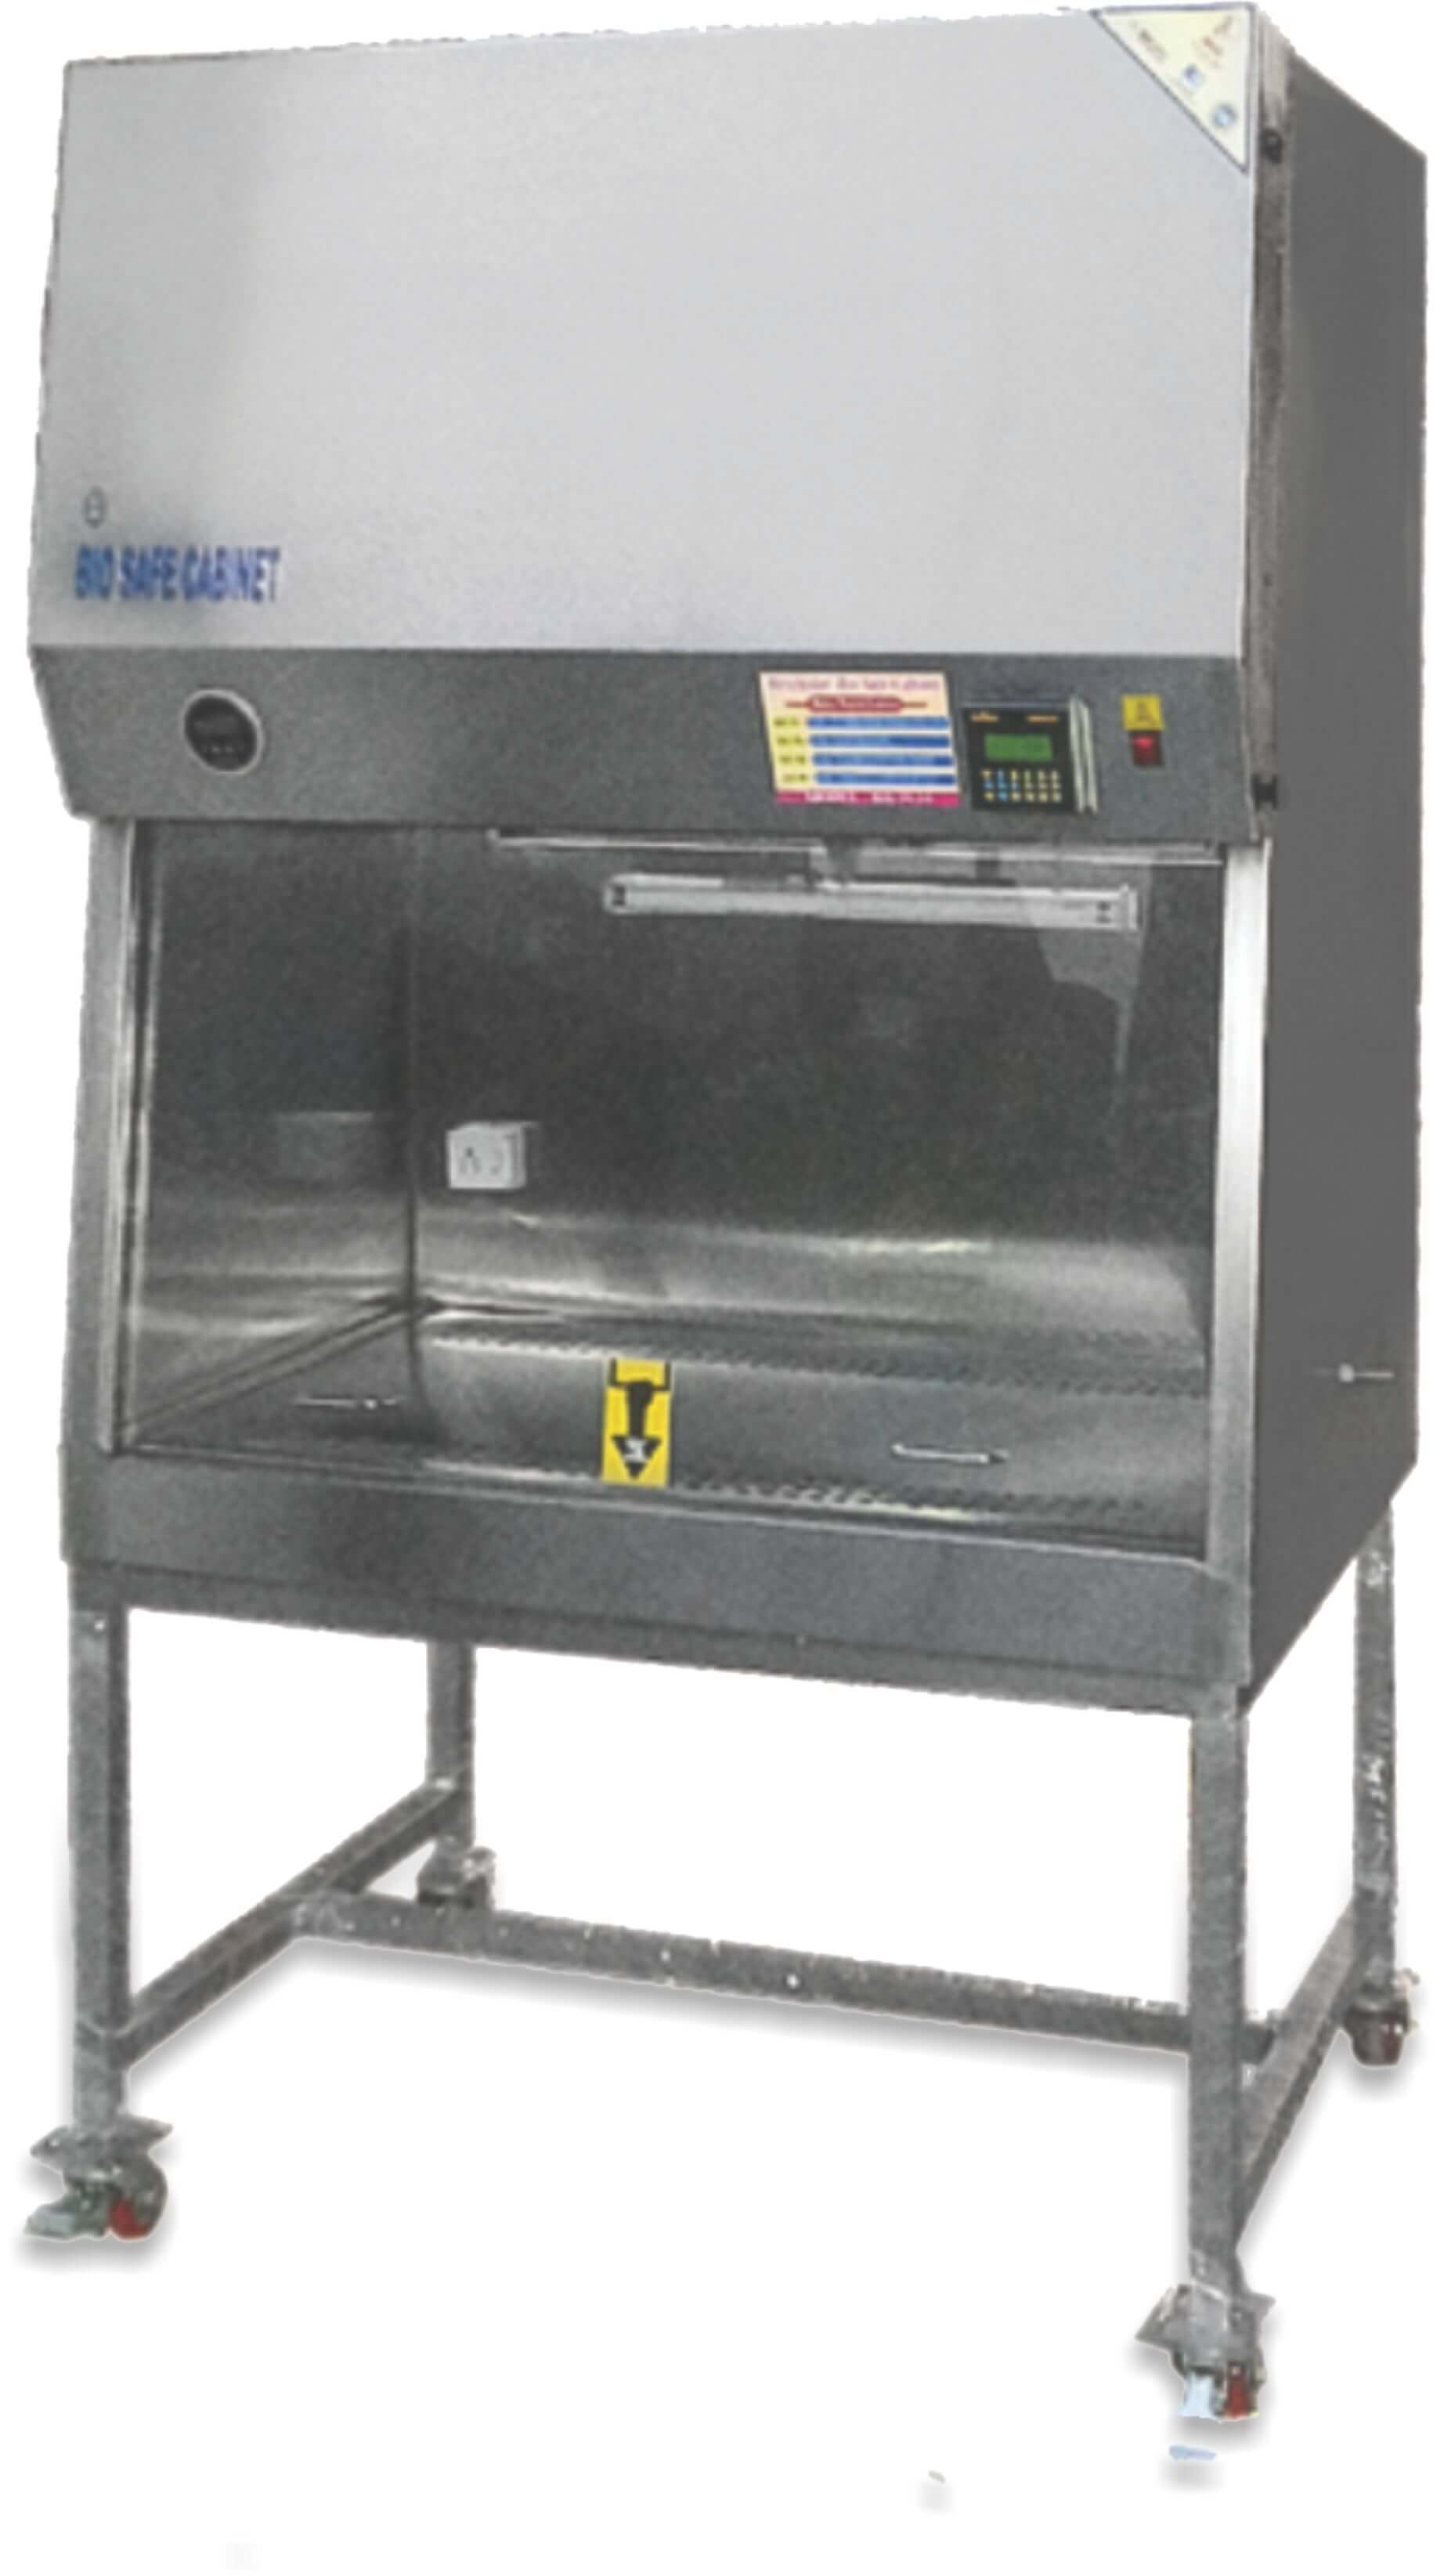 Biosafe Cabinet (Stainless Steel) Class II, A-2